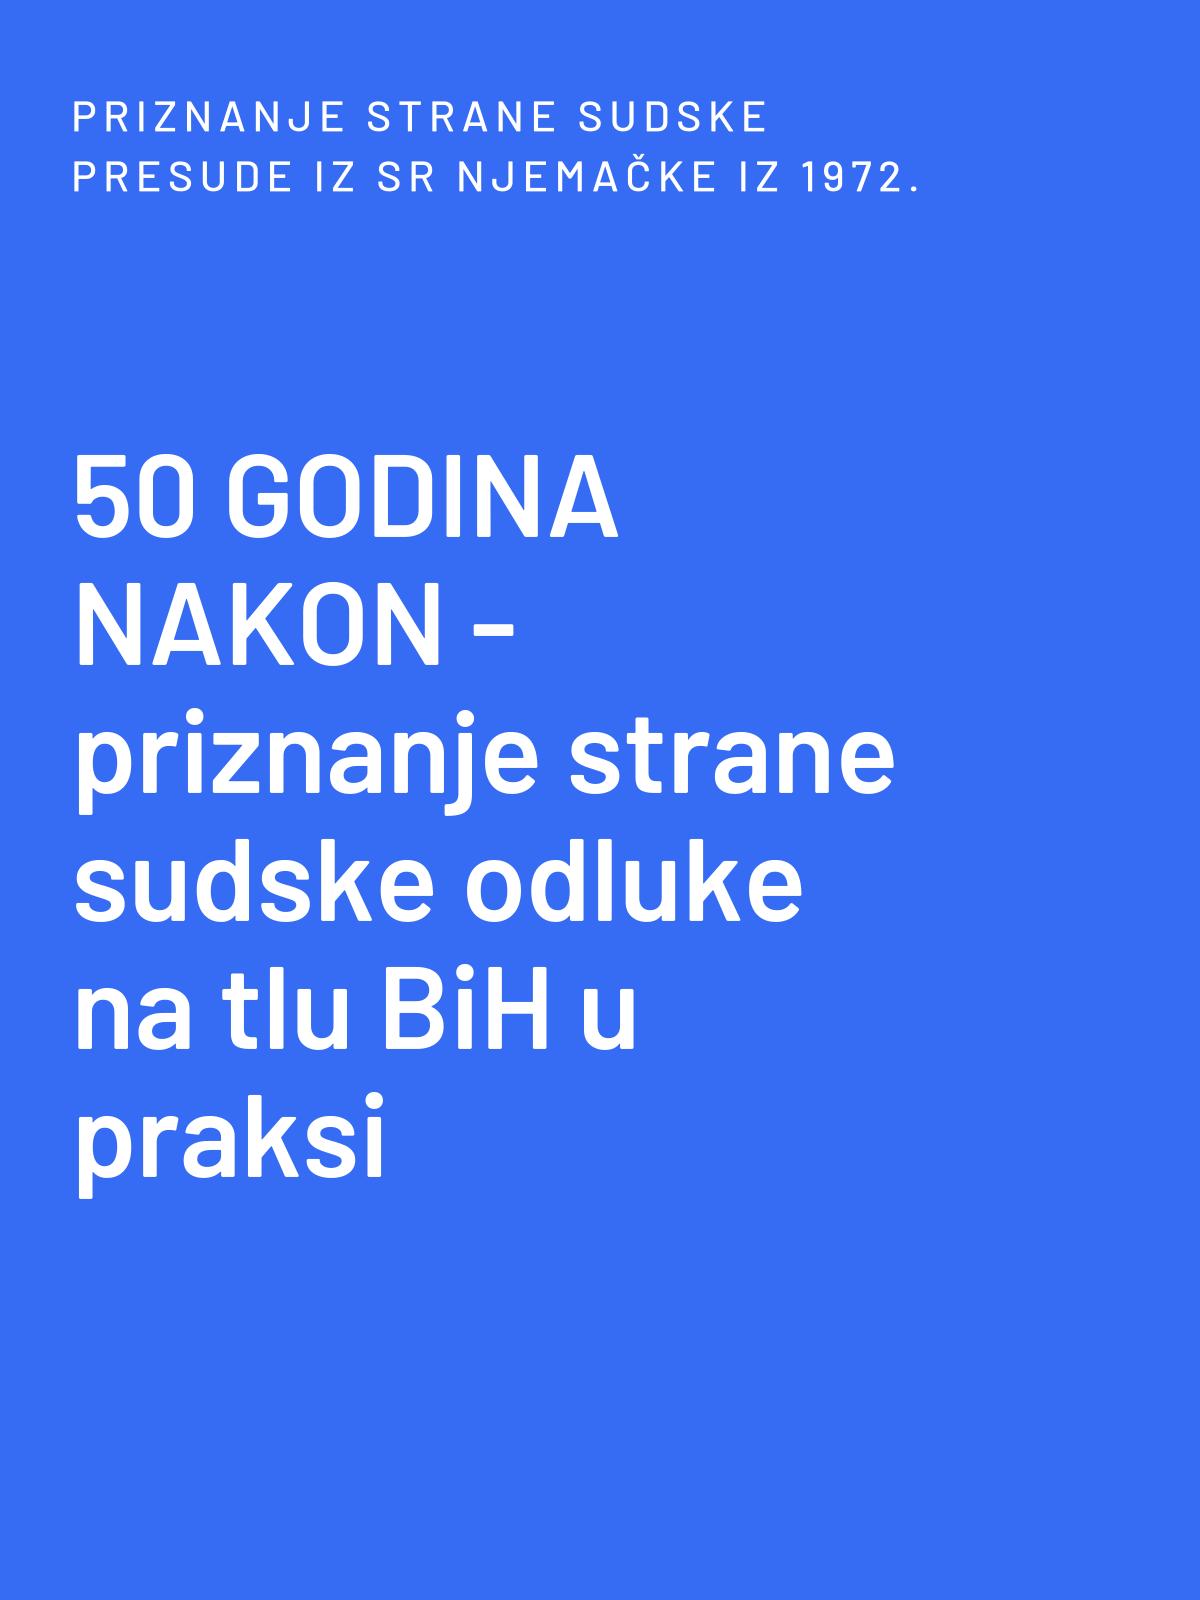 Priznanje strane sudske odluke razvoda braka iz Njemačke u Bosni i Hercegovini – primjer iz prakse